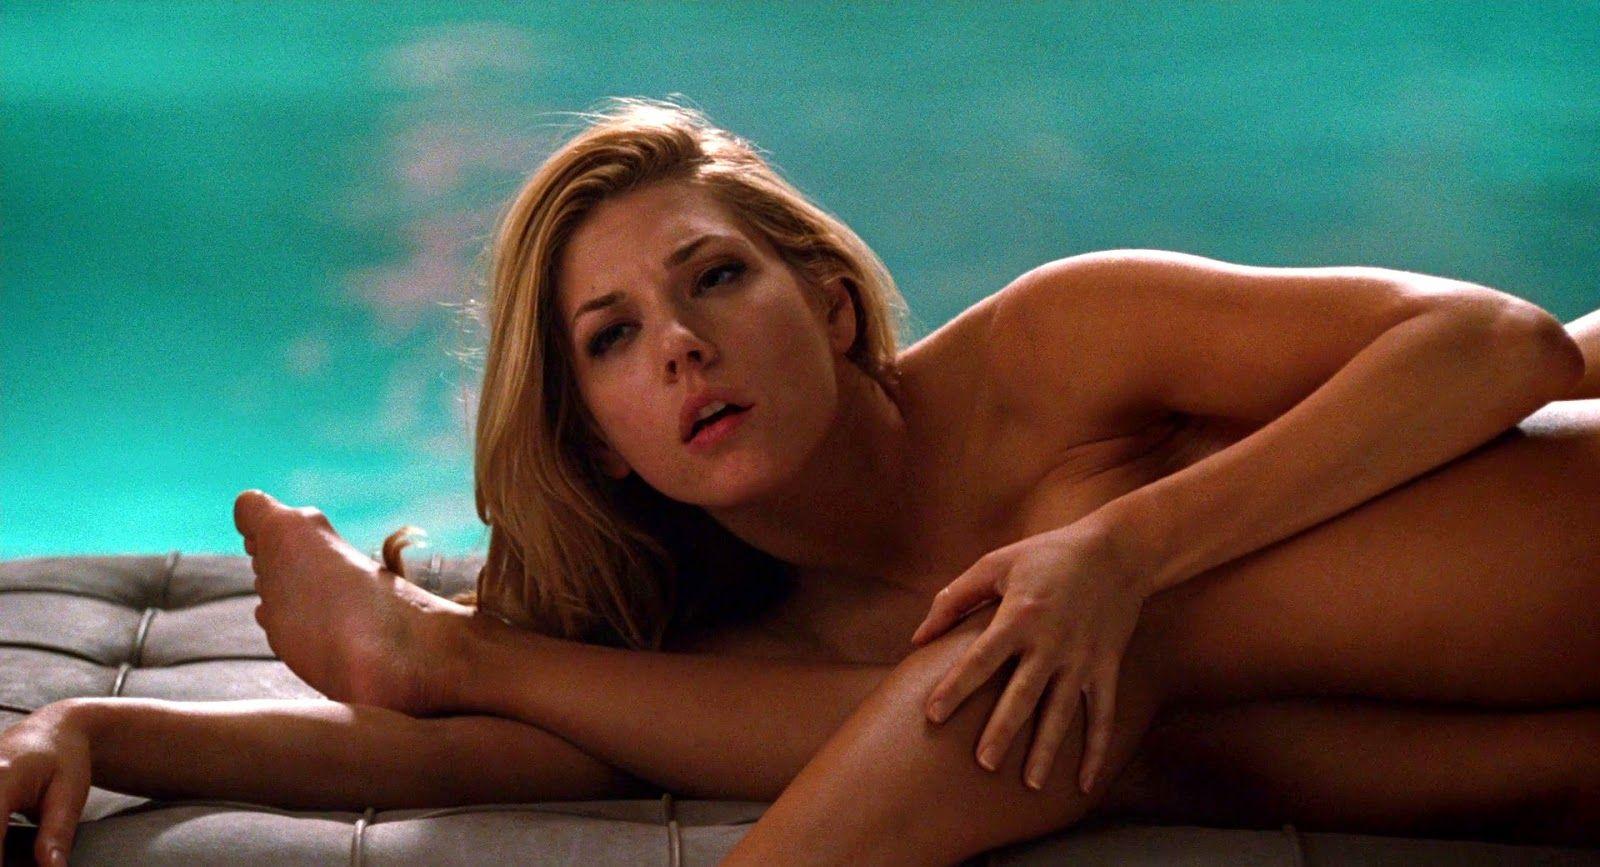 Erotica Katheryn Winnick naked (91 photos), Tits, Leaked, Instagram, cleavage 2020